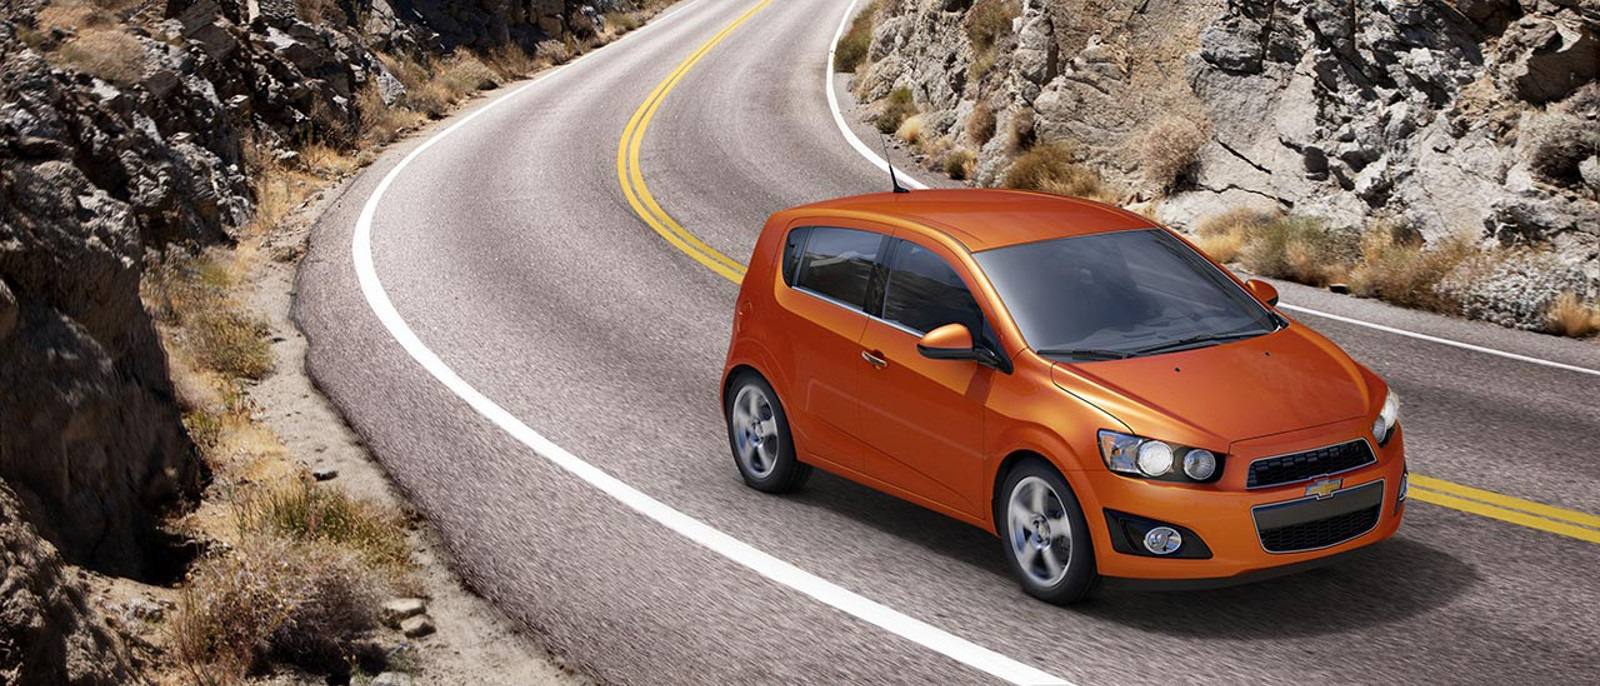 2013 Chevy Sonic Hatchback1